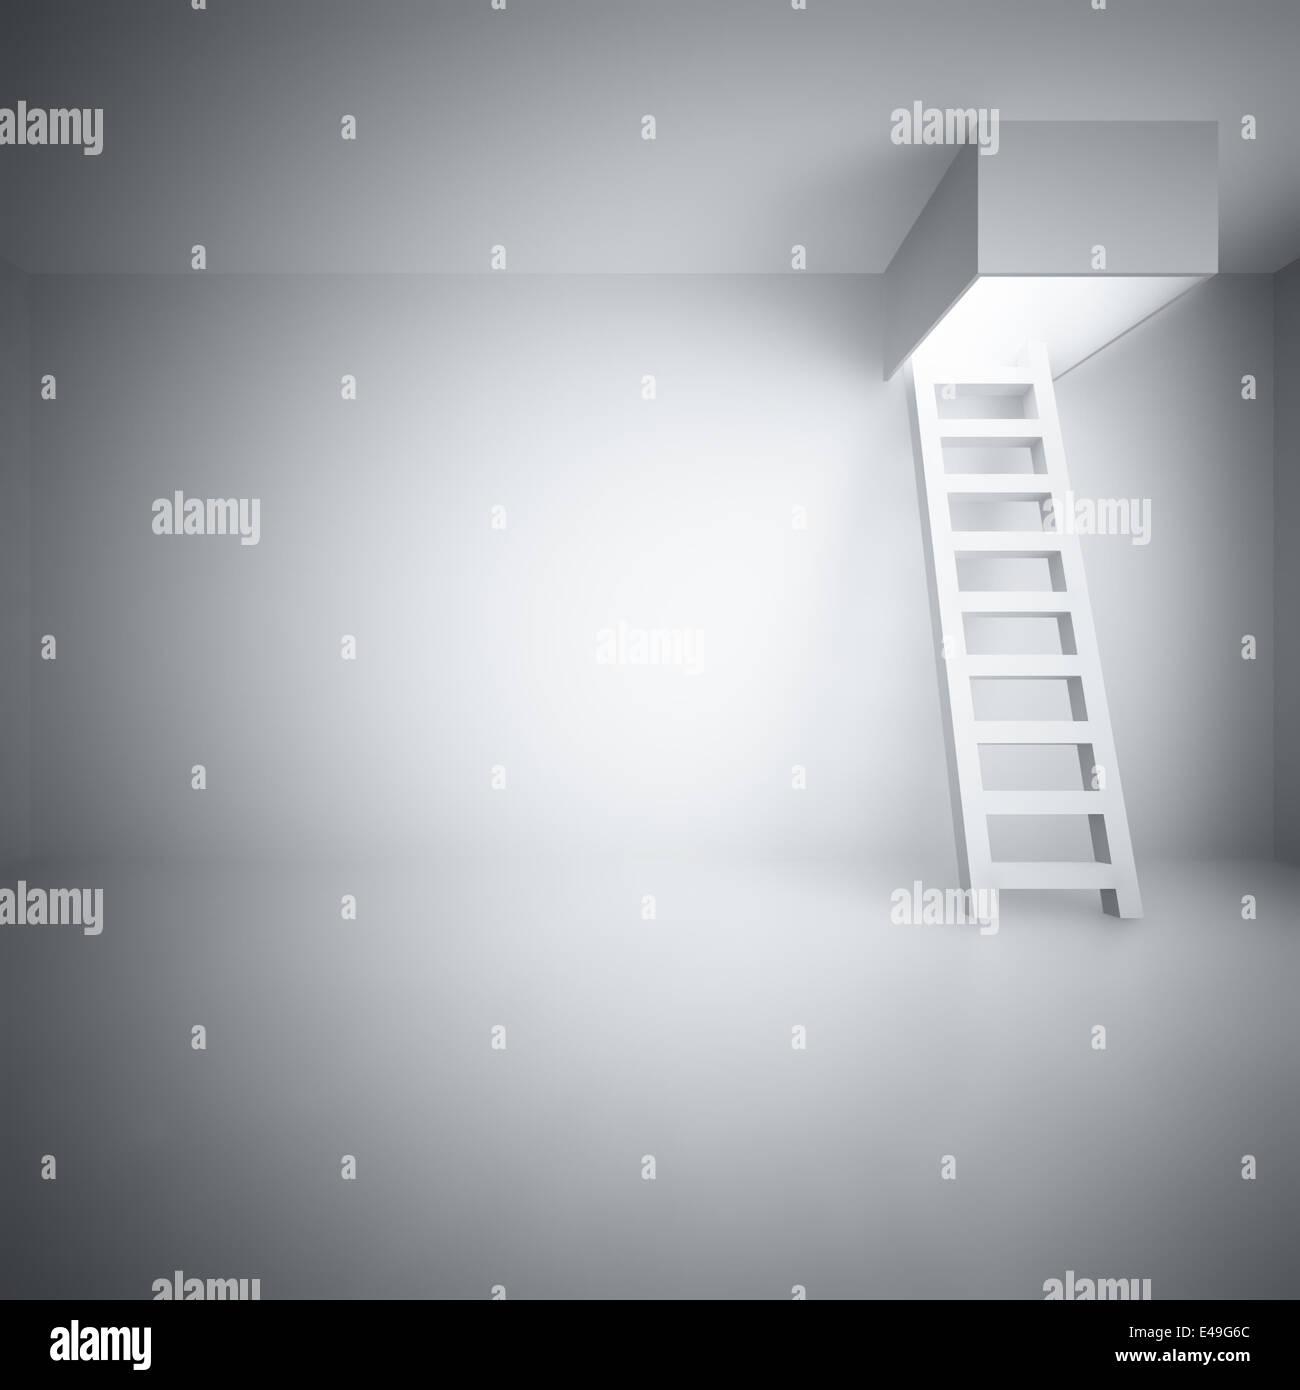 Ladder upwards in a light room - Stock Image